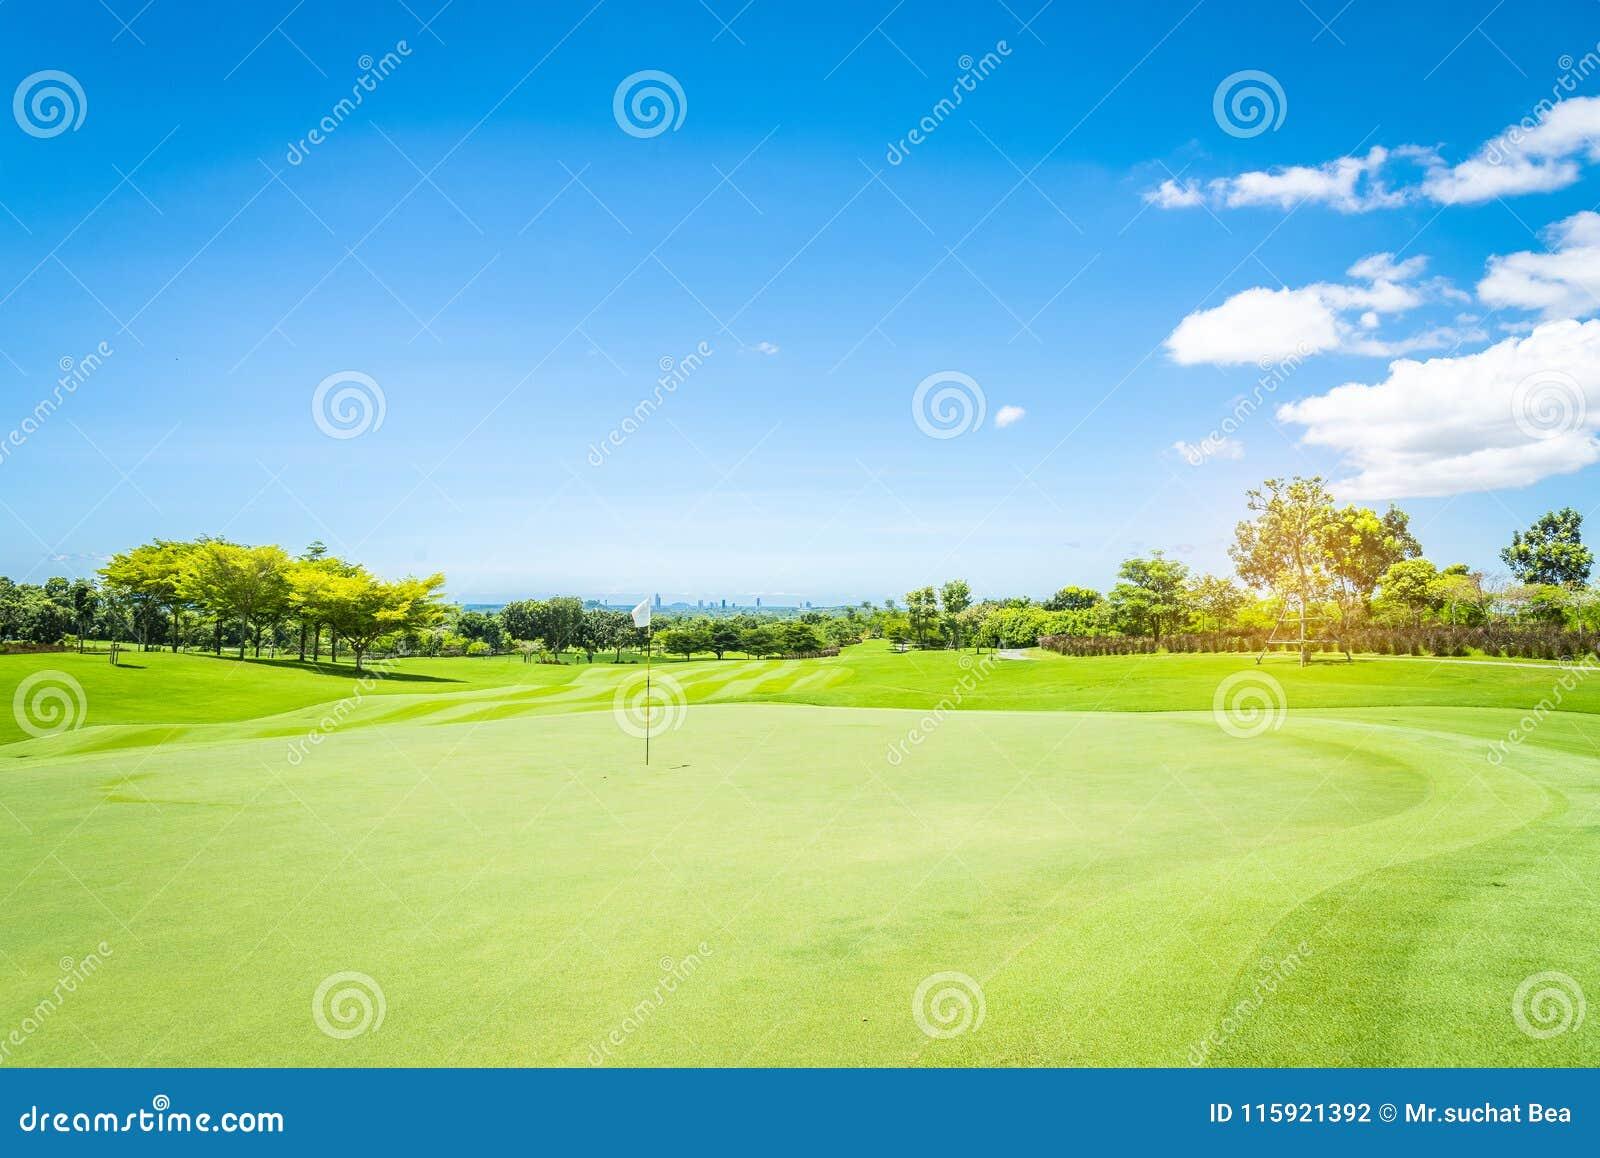 A green grass in Golf Course